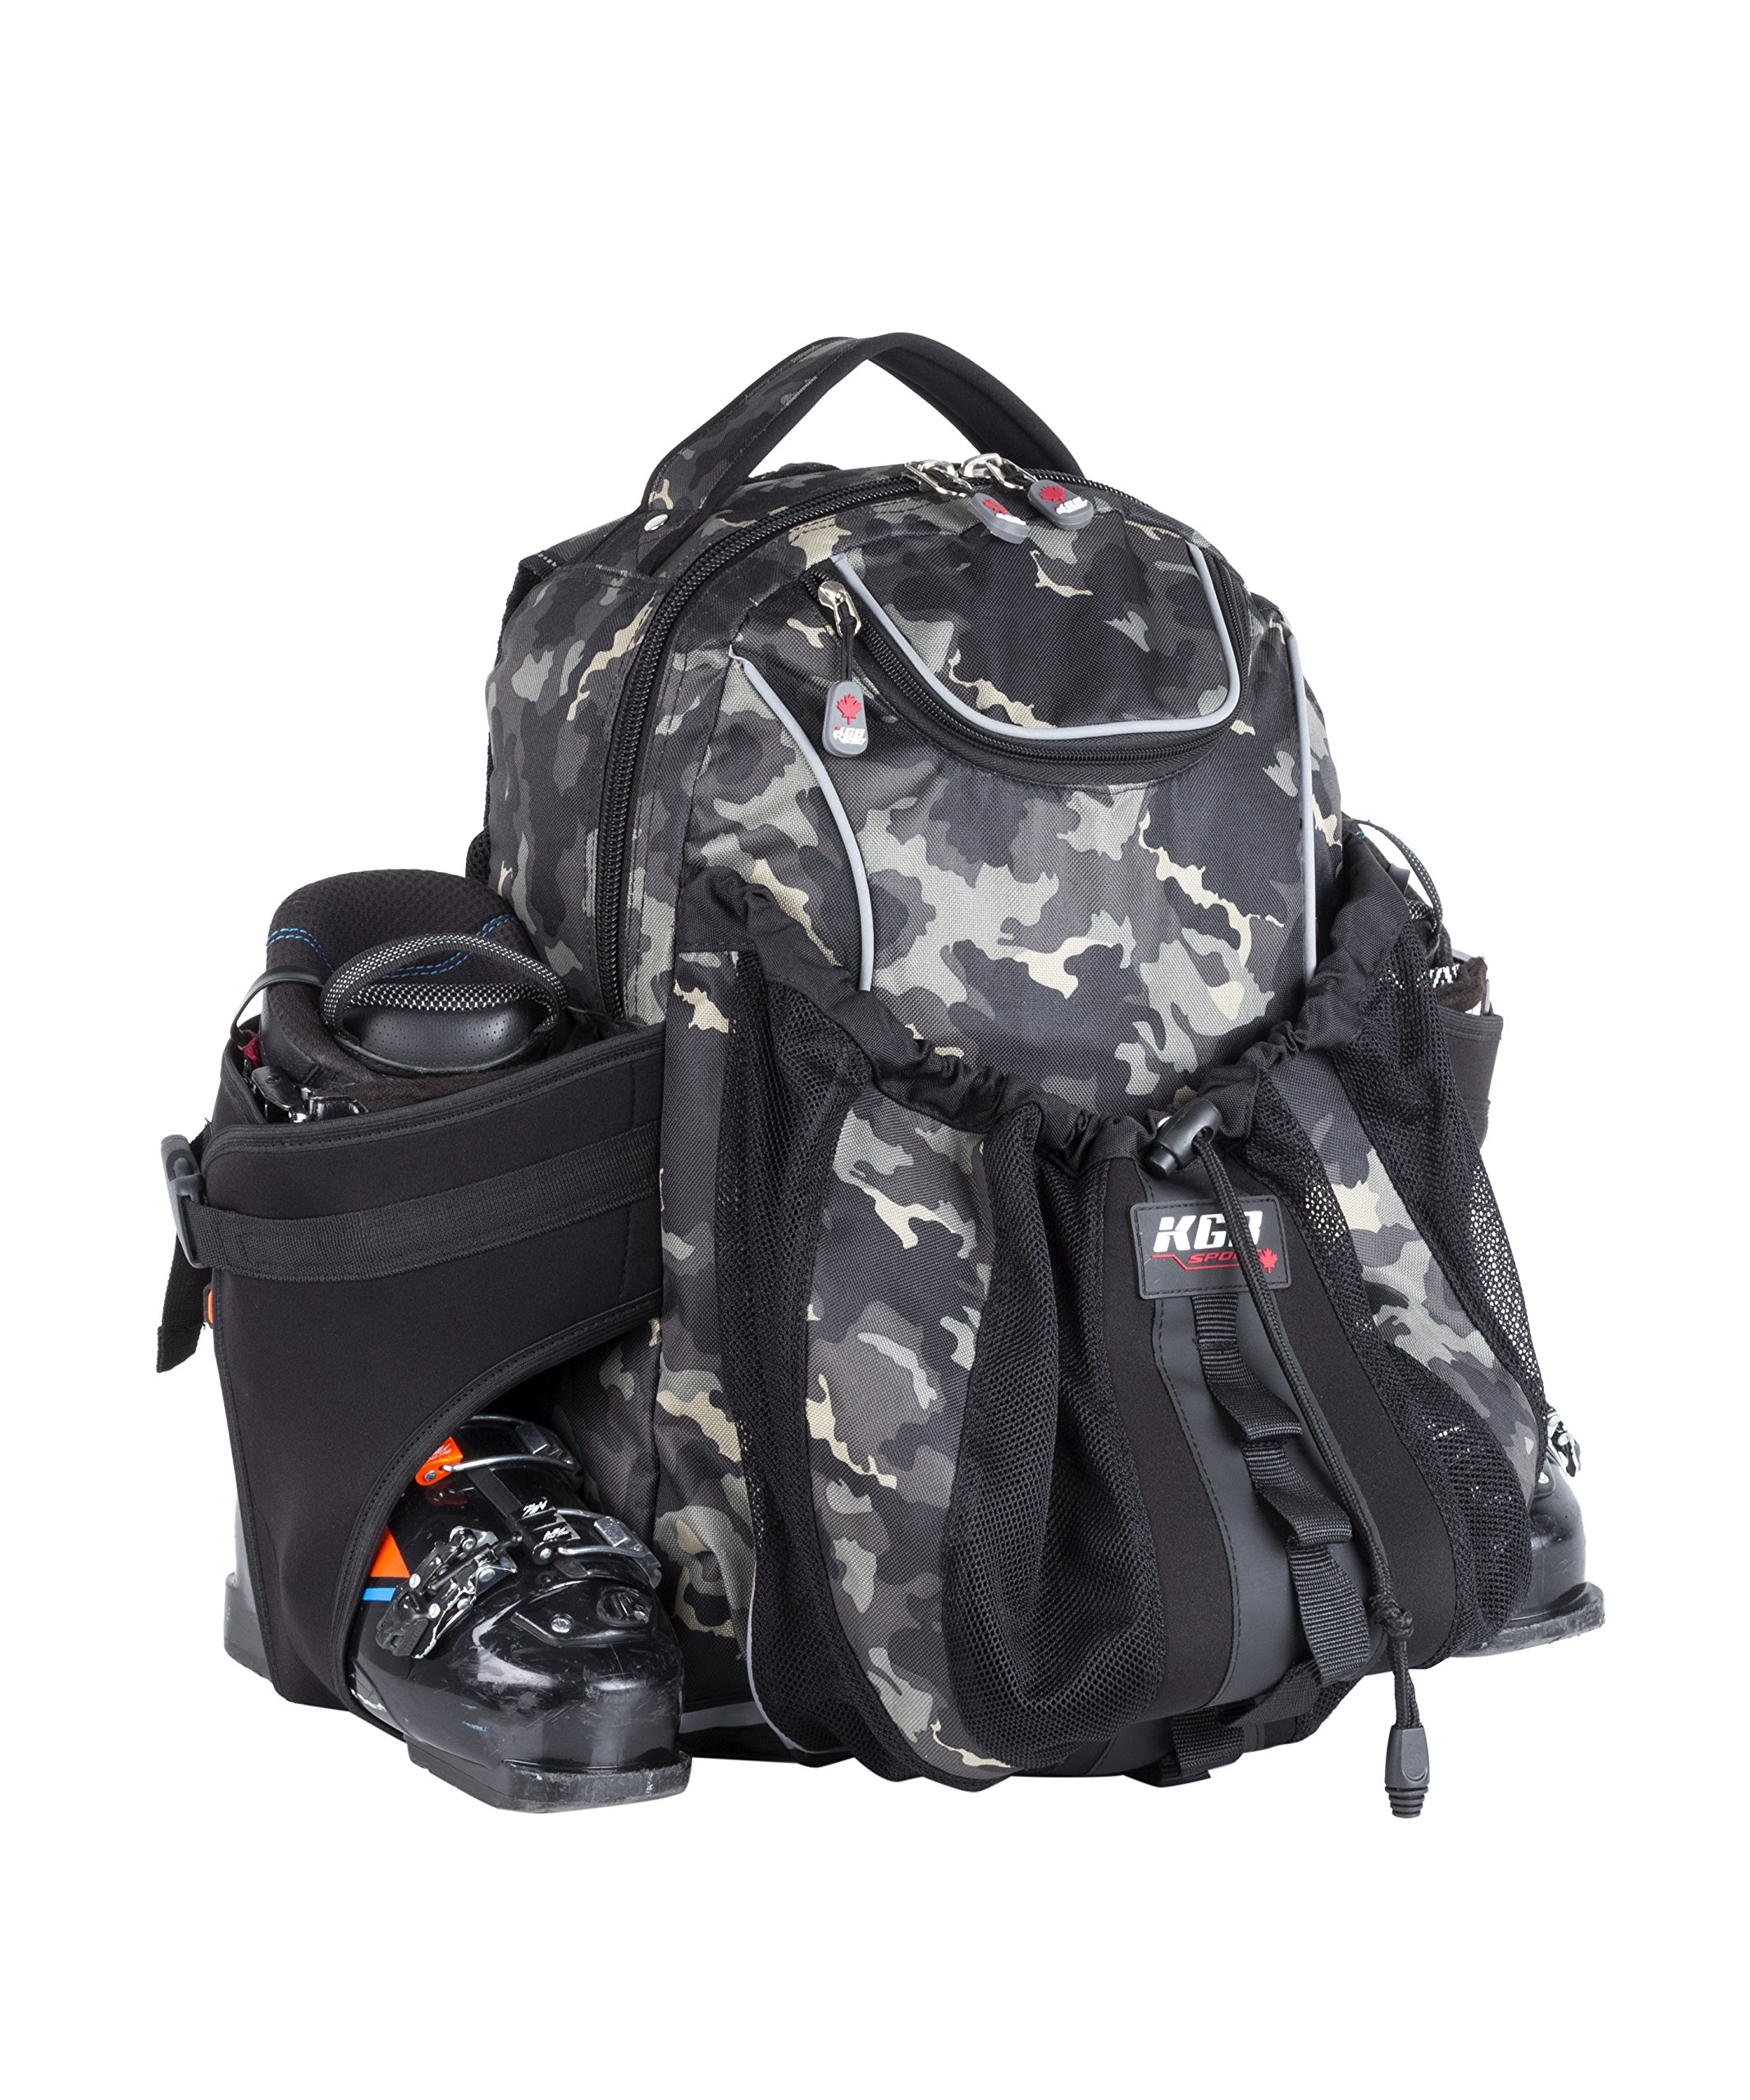 KGB Sport Pro Ski Boots Bag, Camouflage, One Size by KGB Sport